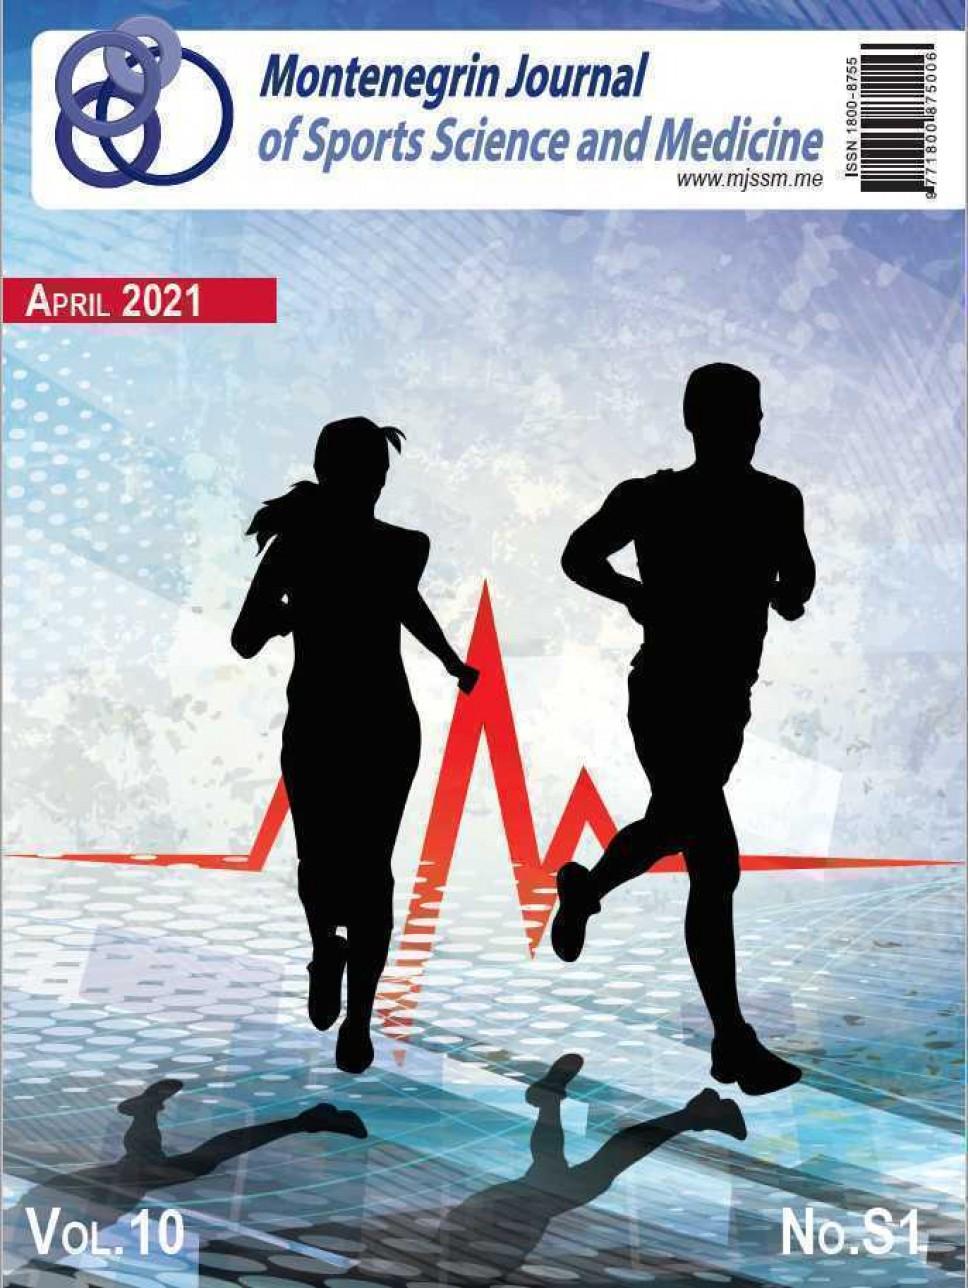 Aprilsko izdanje časopisa MJSSM ogledalo uspjeha CSA konferencije 2021